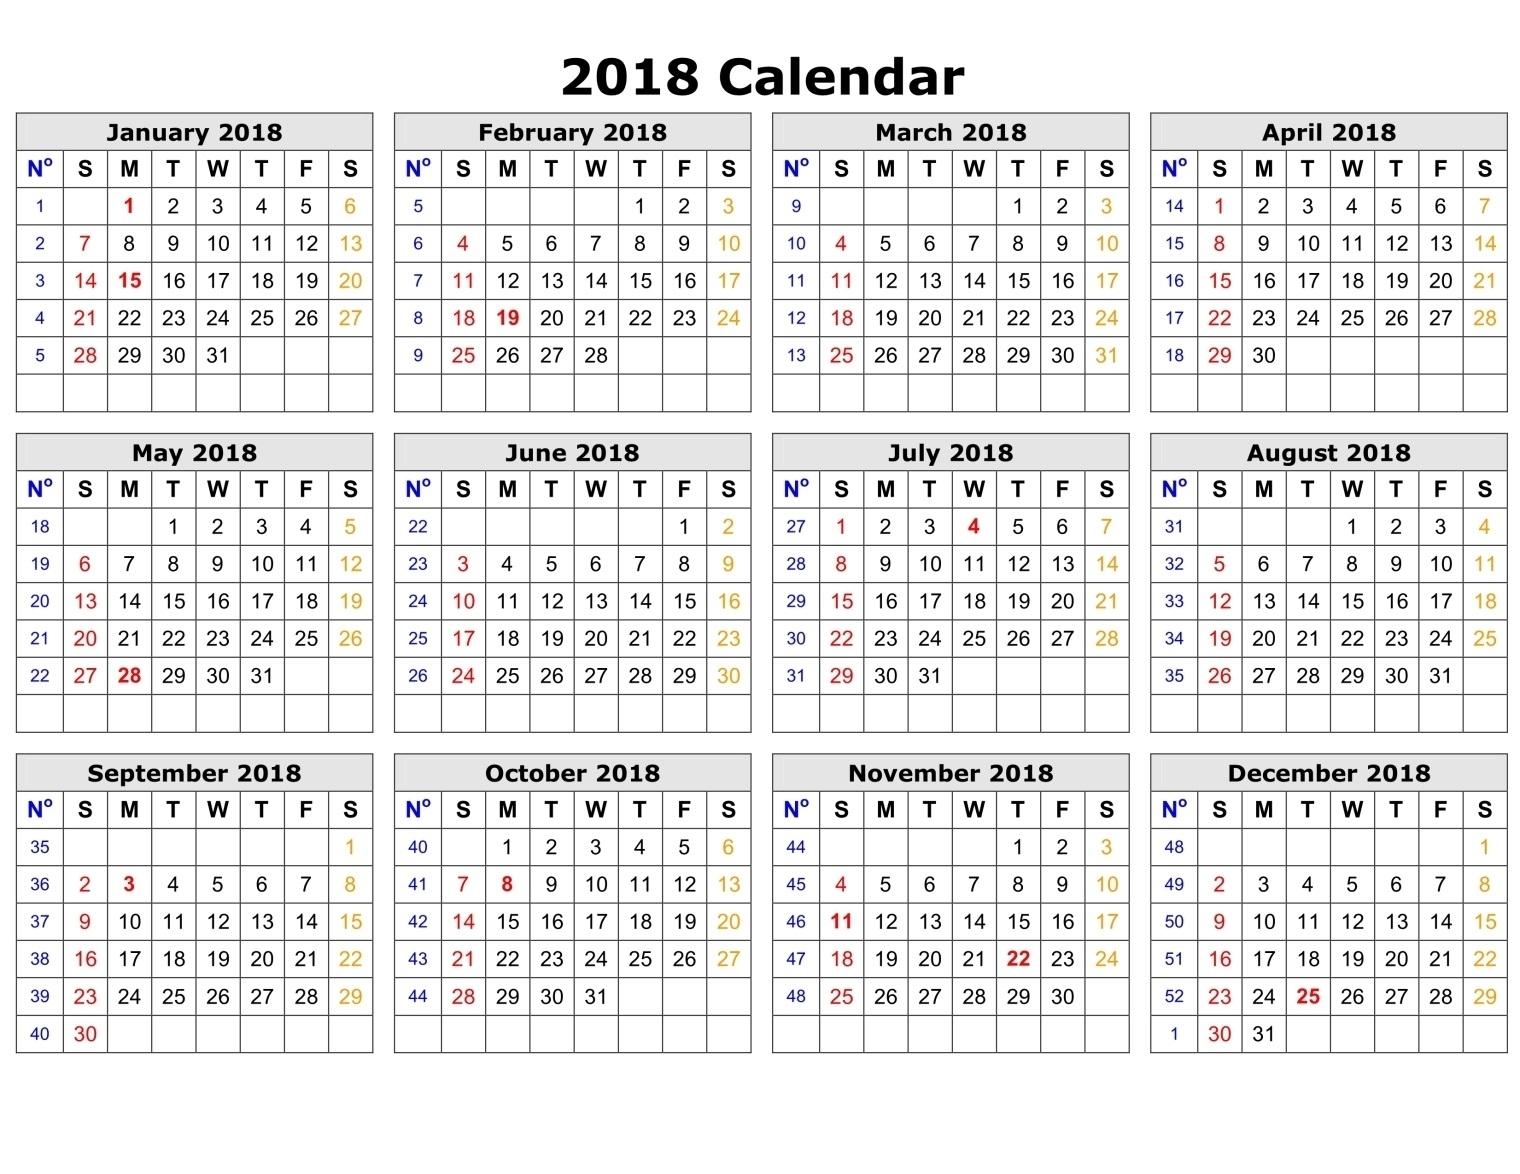 printable calendar 2018 templates printable calendar templates 2018 2018 Printable Calendar Template erdferdf